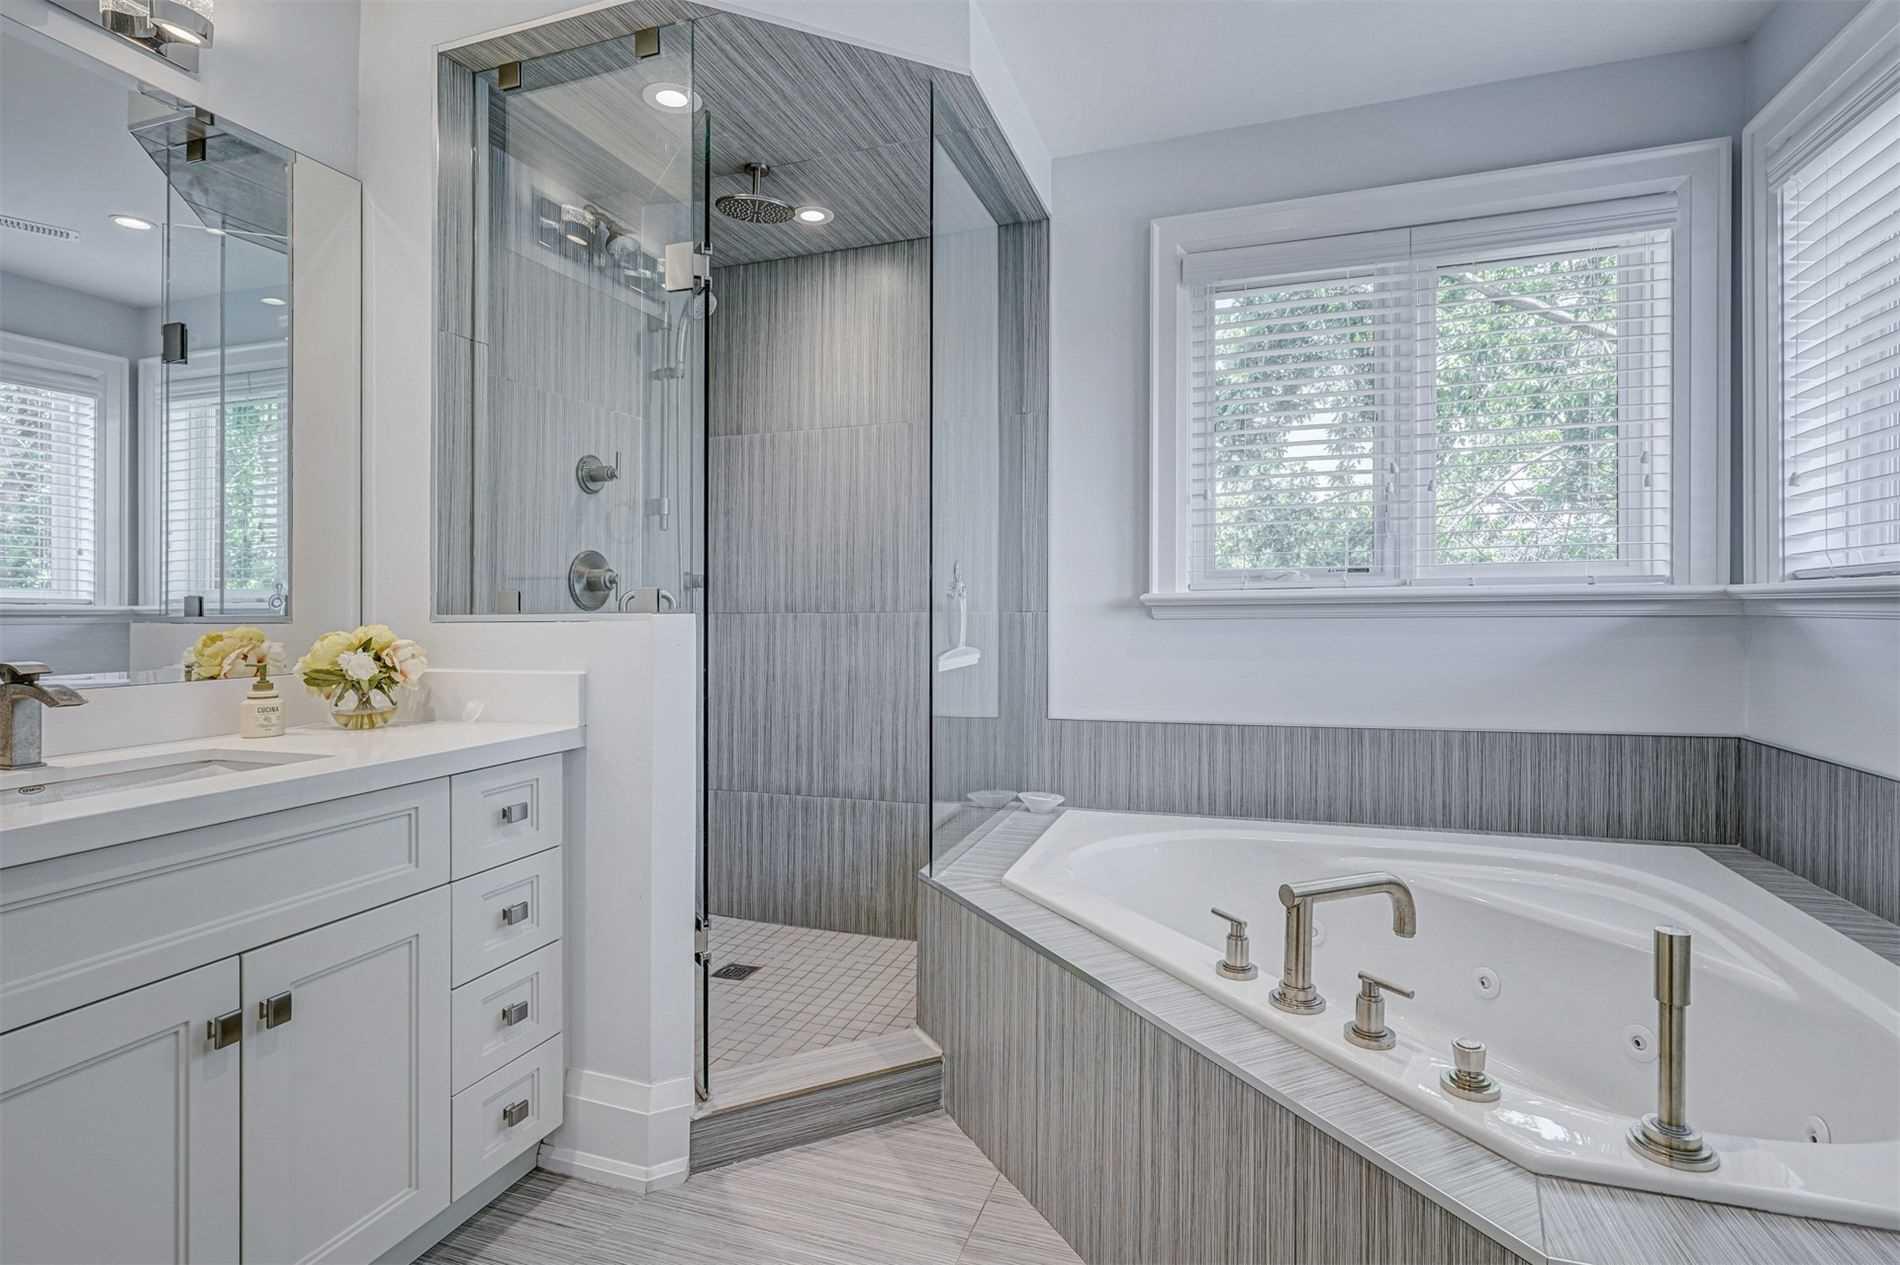 27 Minford Ave, Toronto, Ontario M1R2B2, 3 Bedrooms Bedrooms, 8 Rooms Rooms,5 BathroomsBathrooms,Detached,For Sale,Minford,E5290924